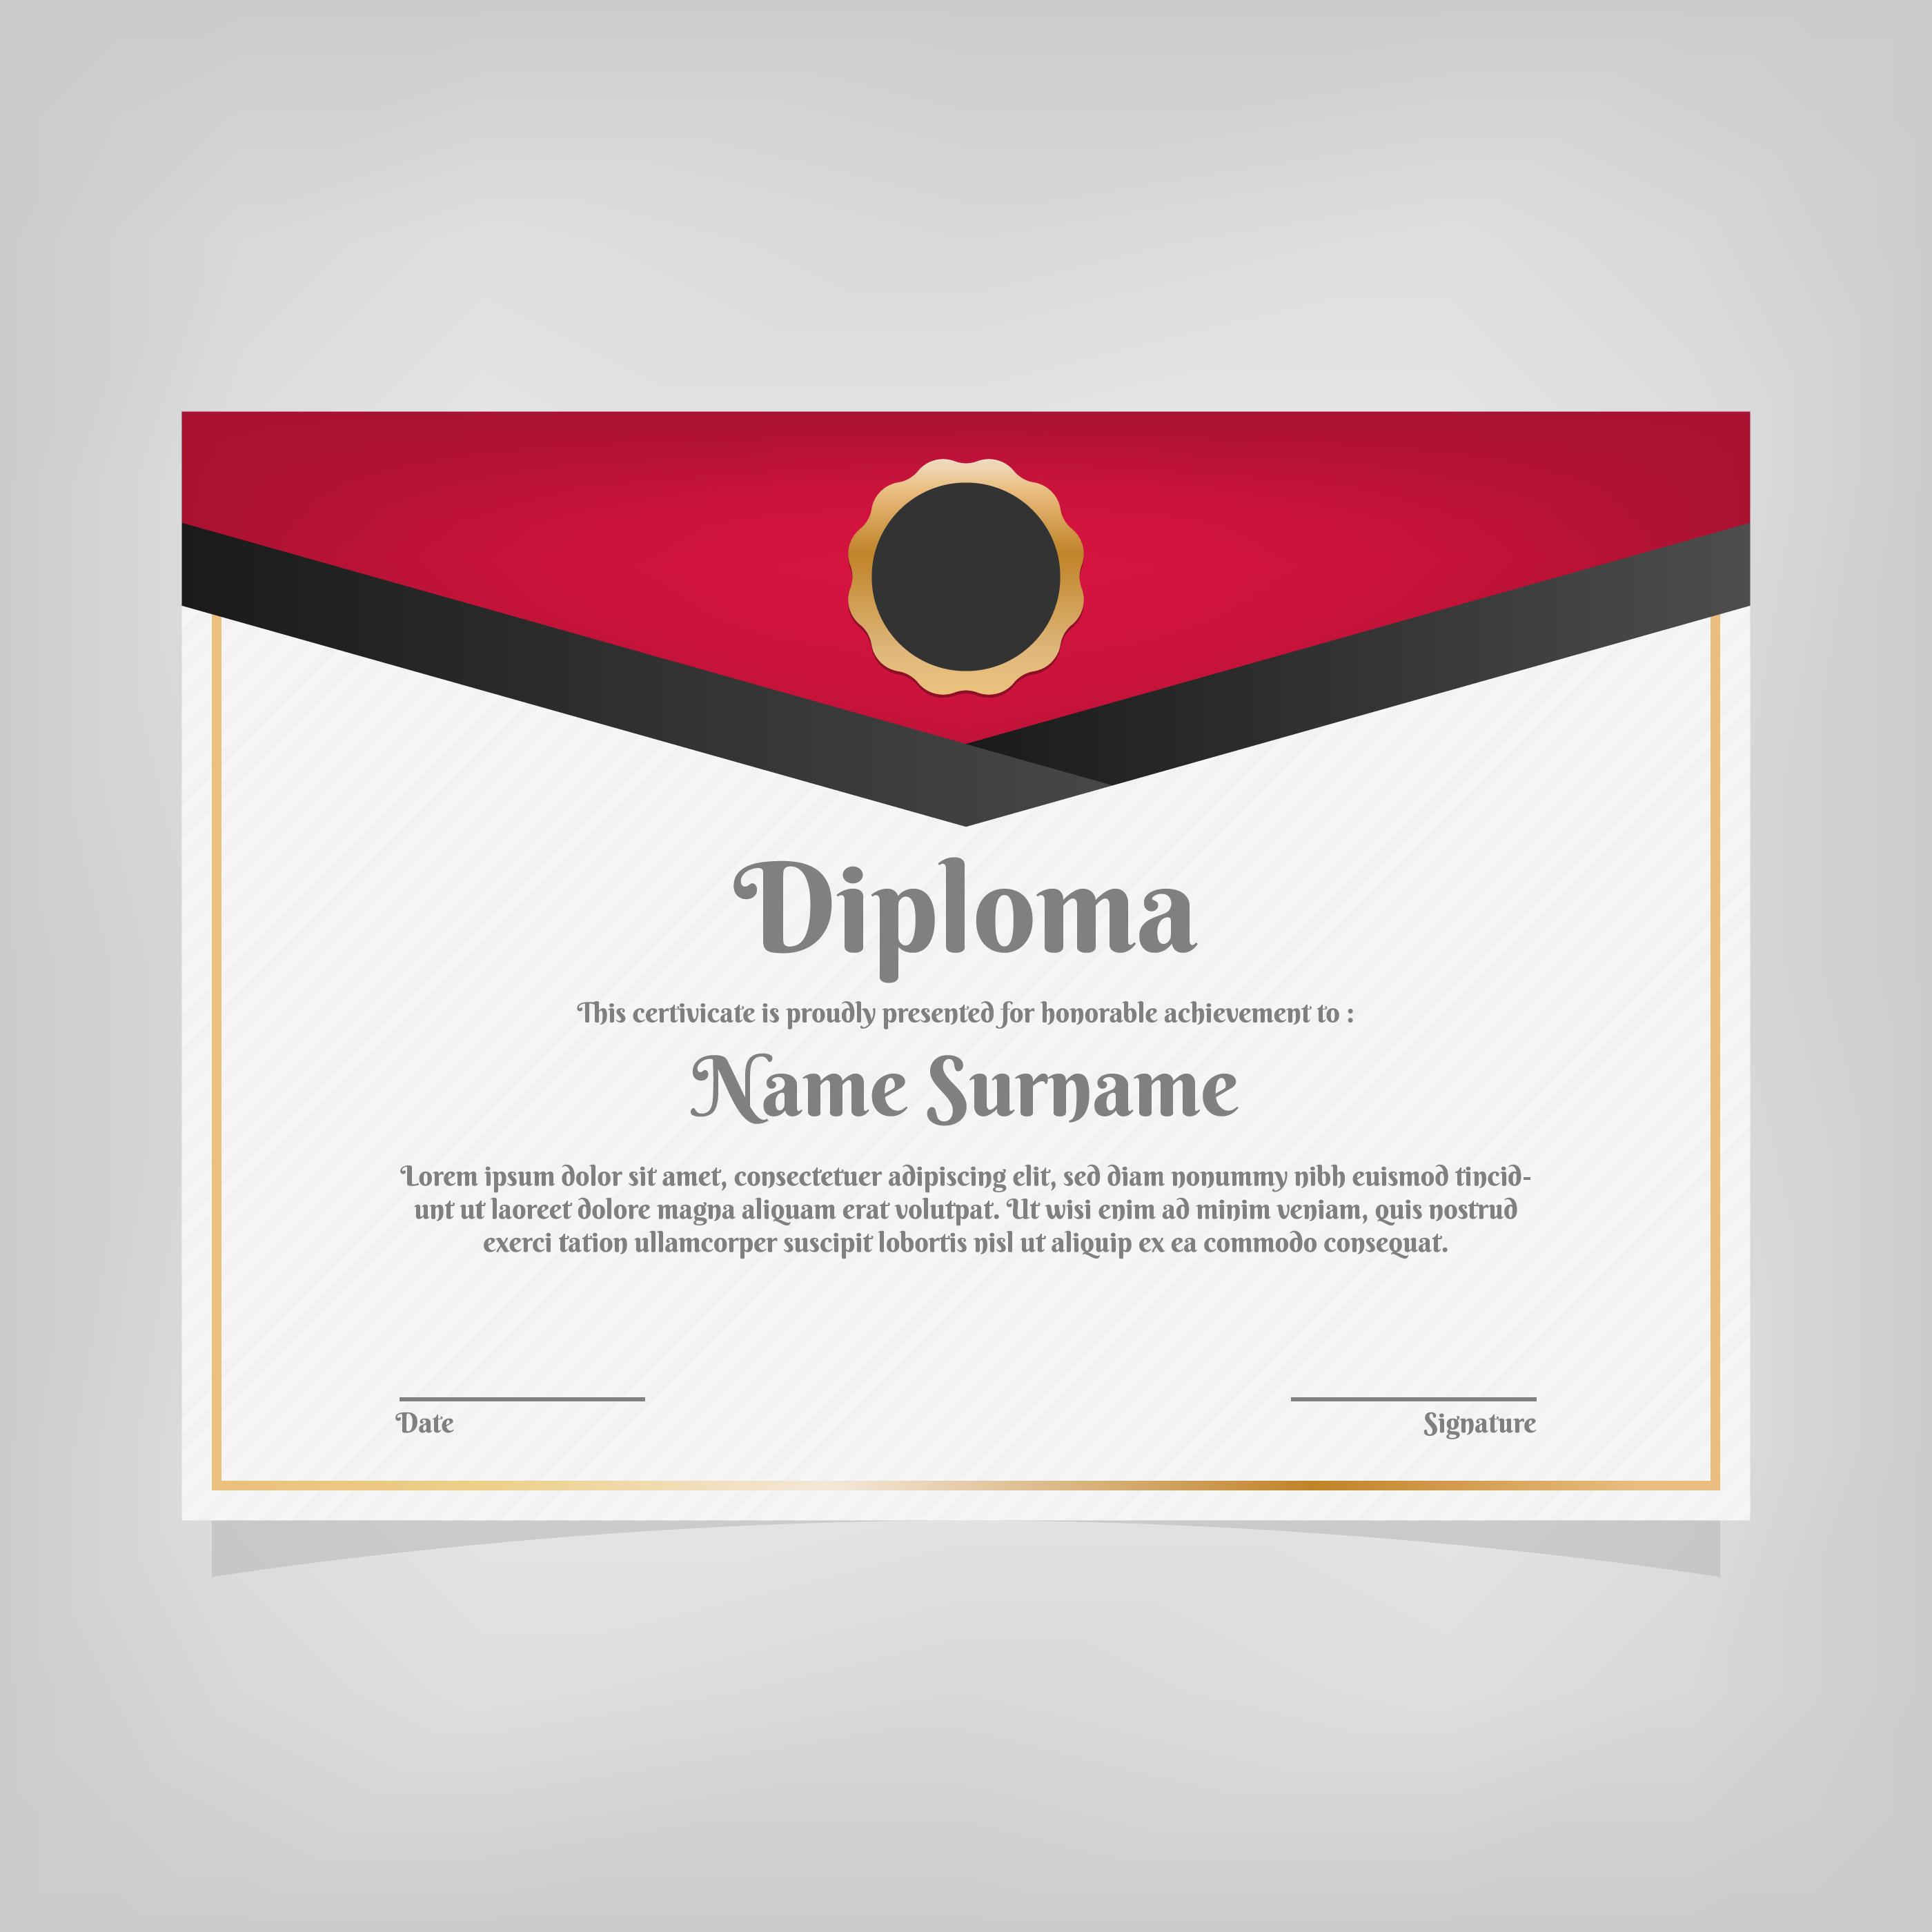 certificate template awards diploma download free vector art